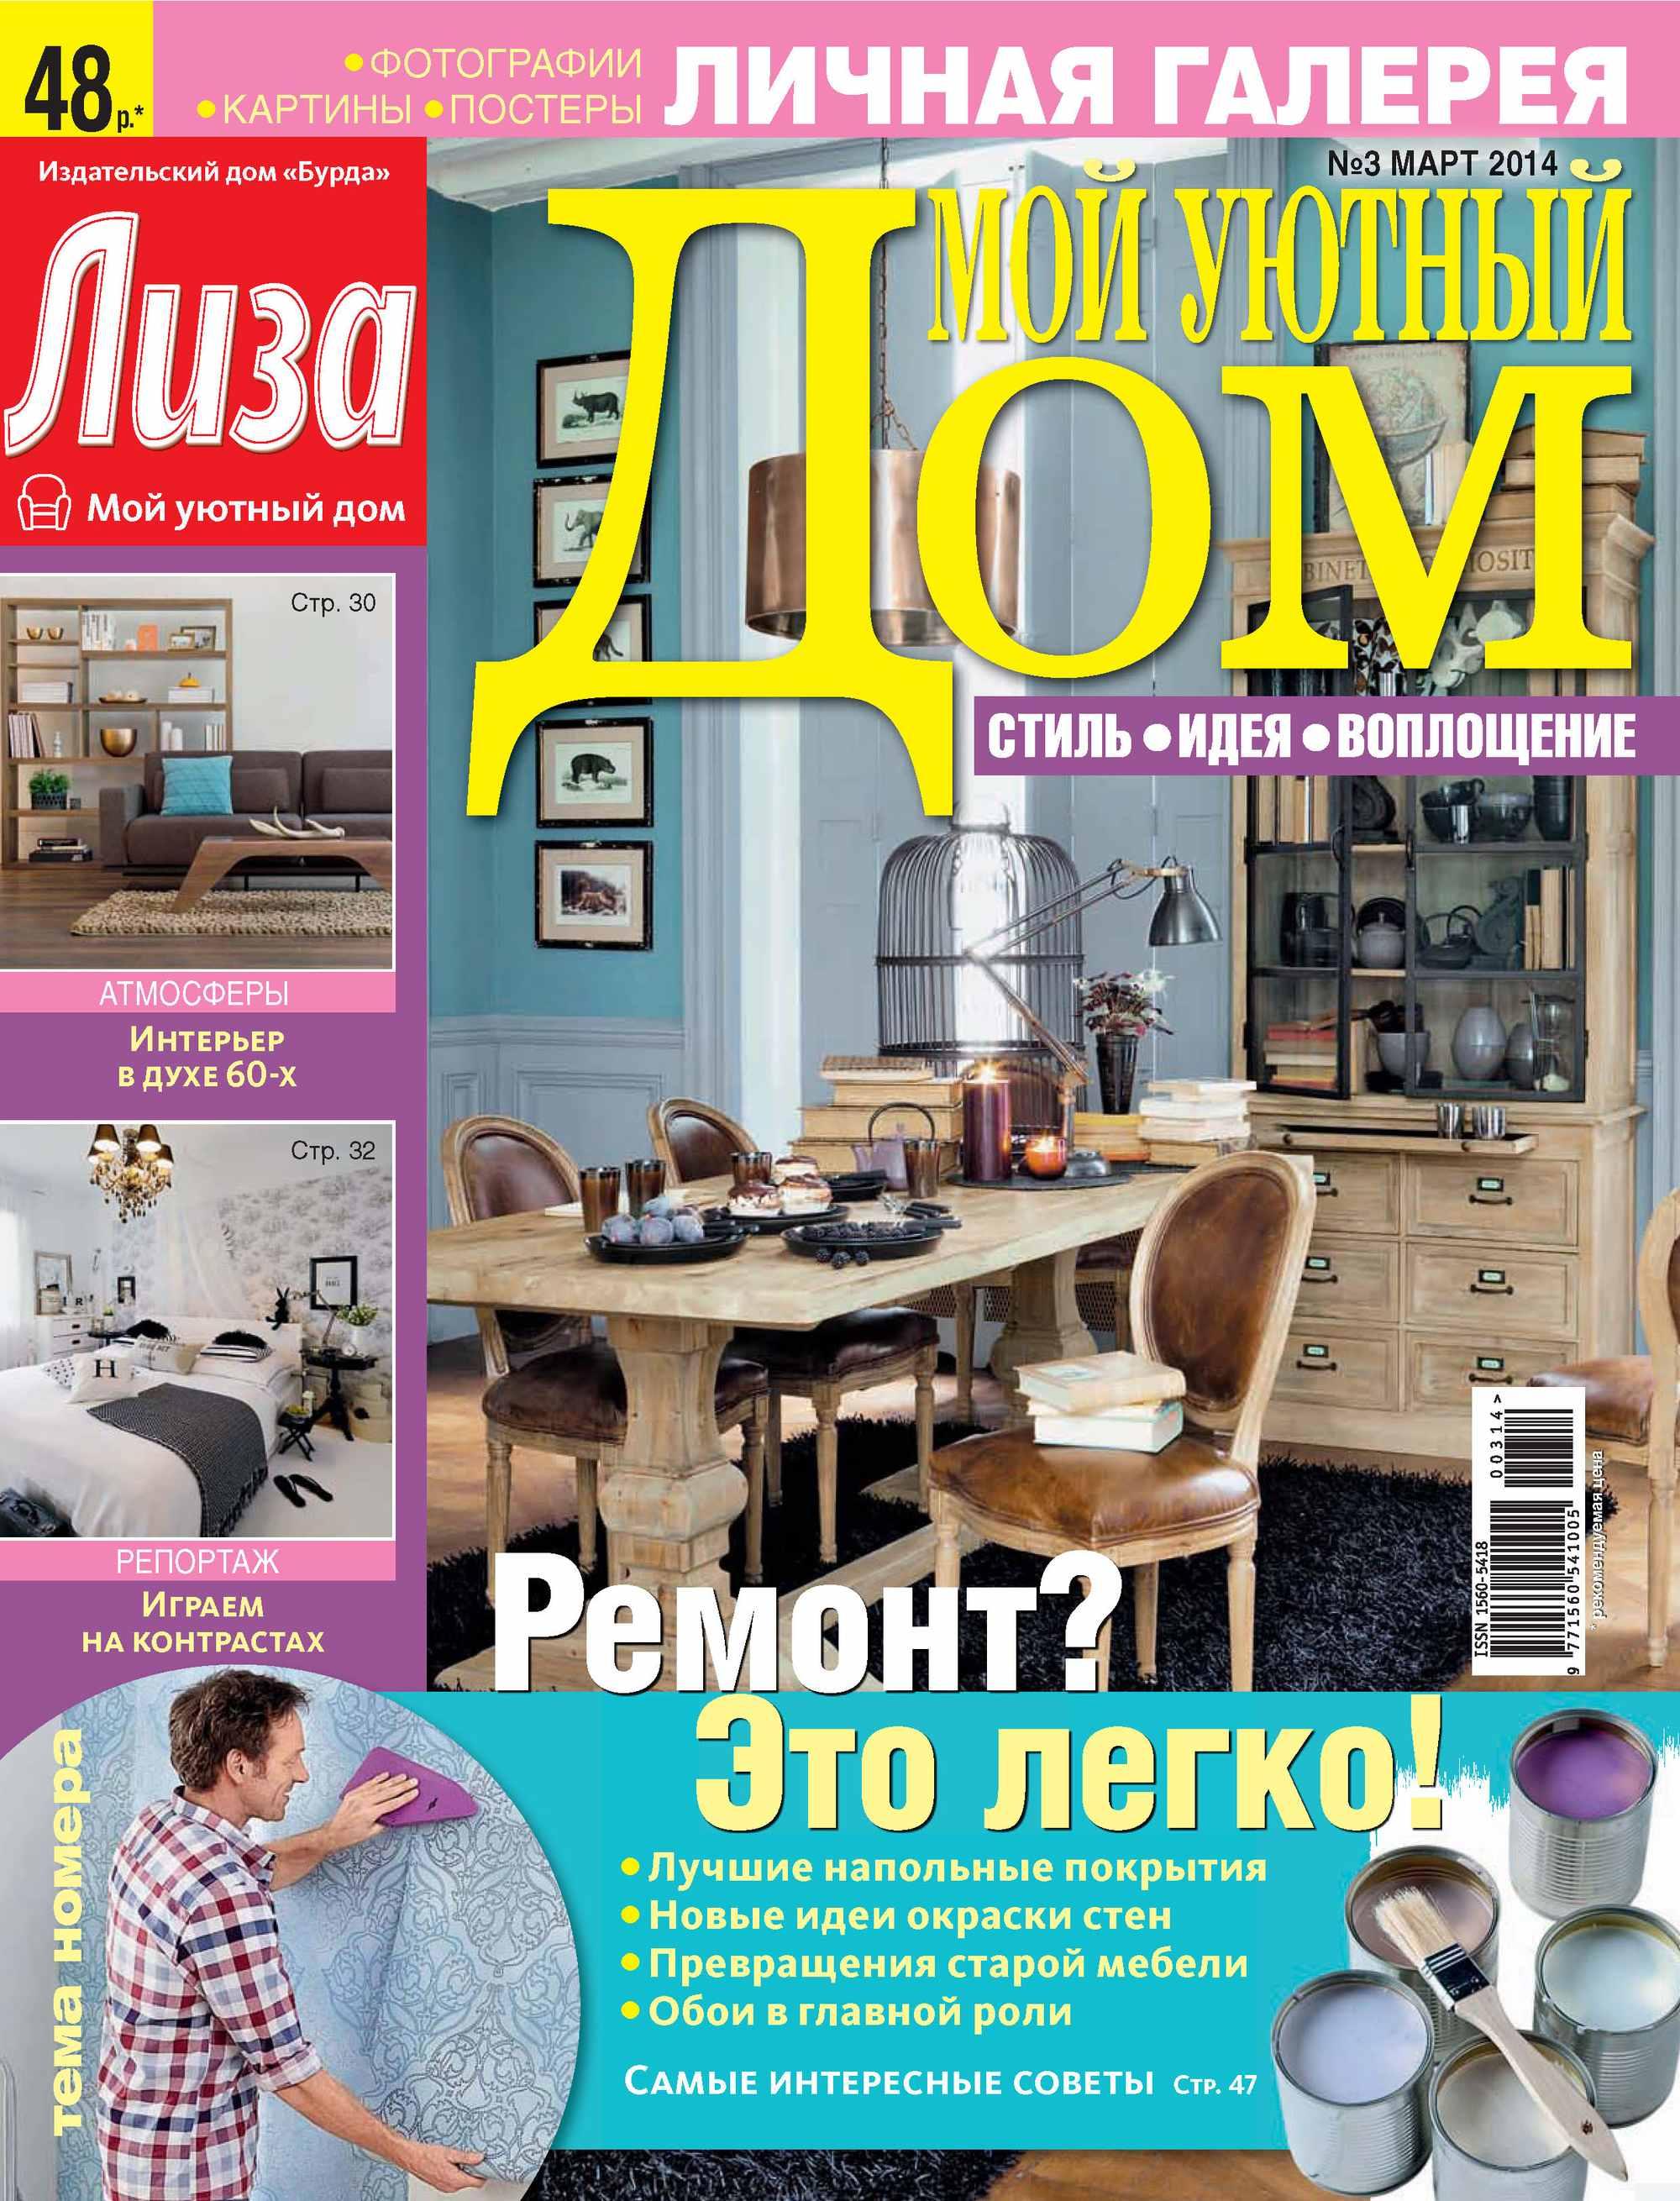 ИД «Бурда» Журнал «Лиза. Мой уютный дом» №03/2014 ид бурда журнал лиза мой уютный дом 04 2014